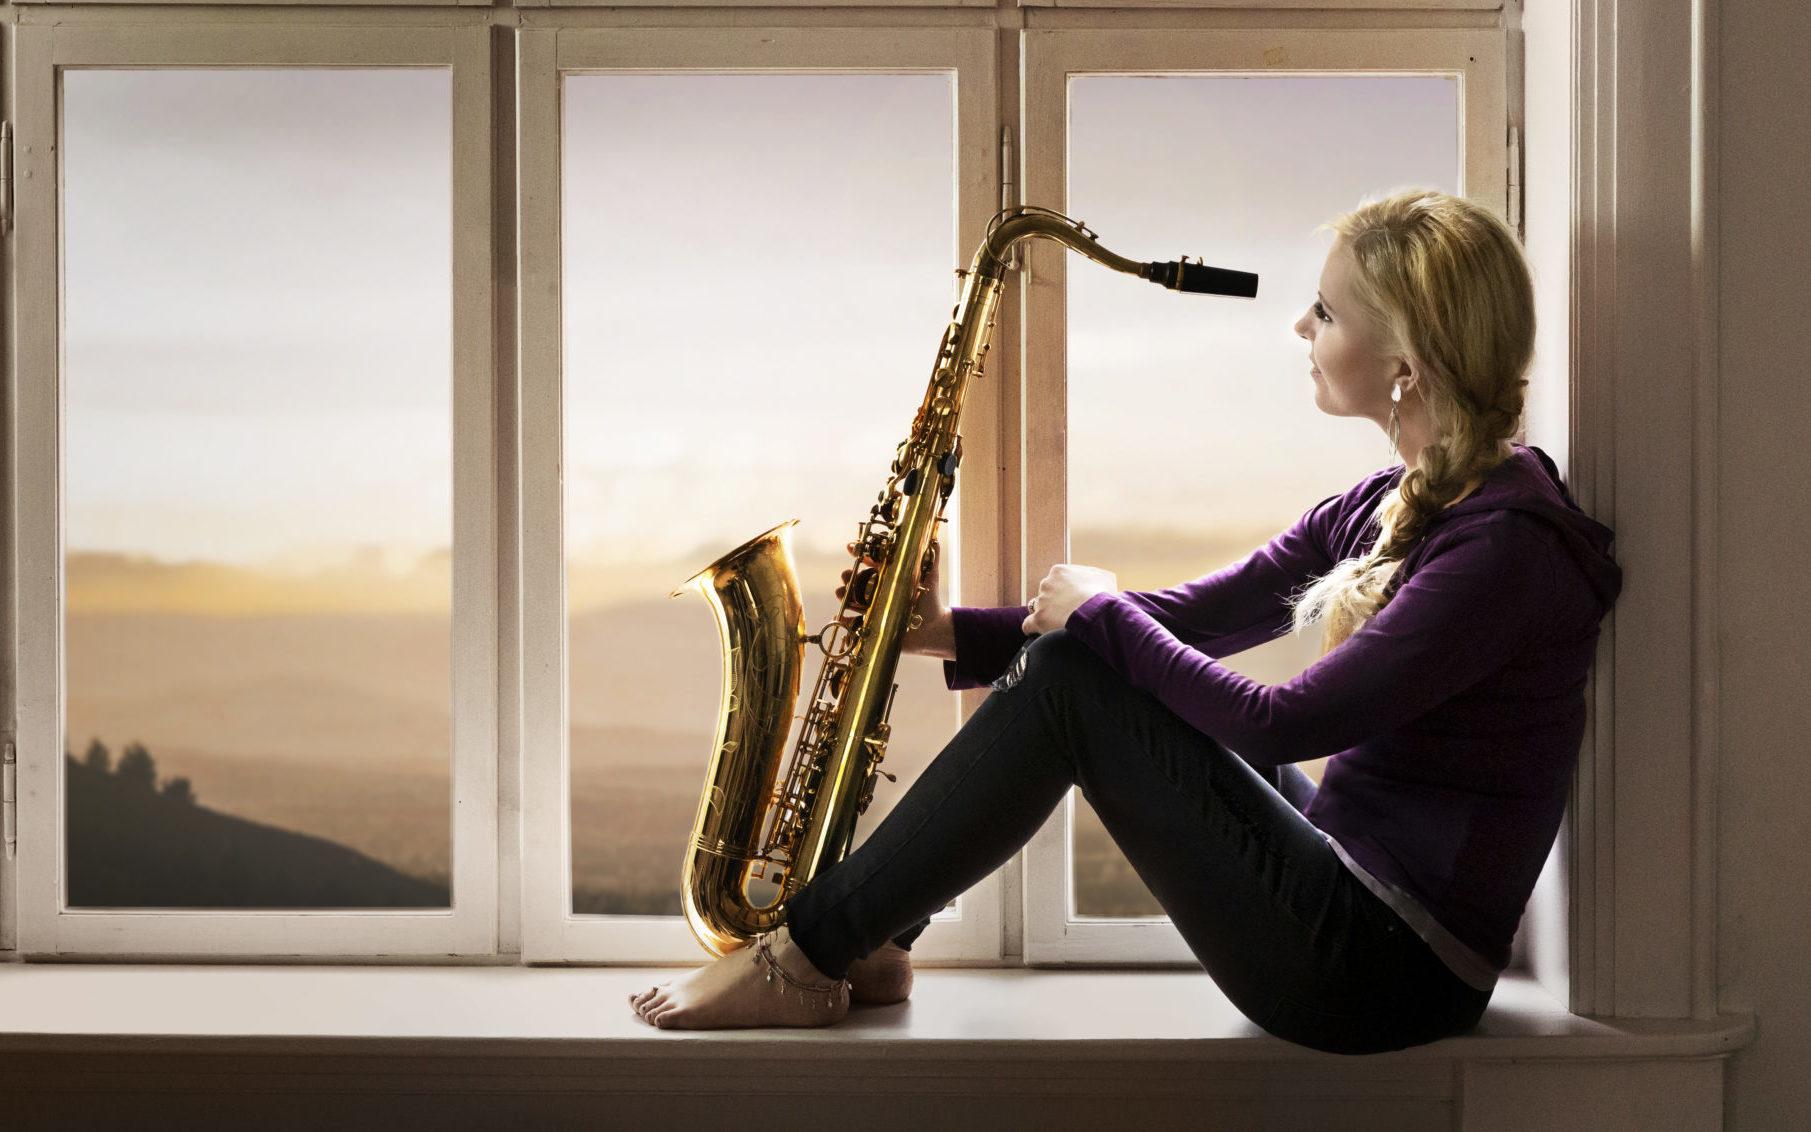 Sarah Elgeti_saxophone player_flutist_jazz_denmark_musician